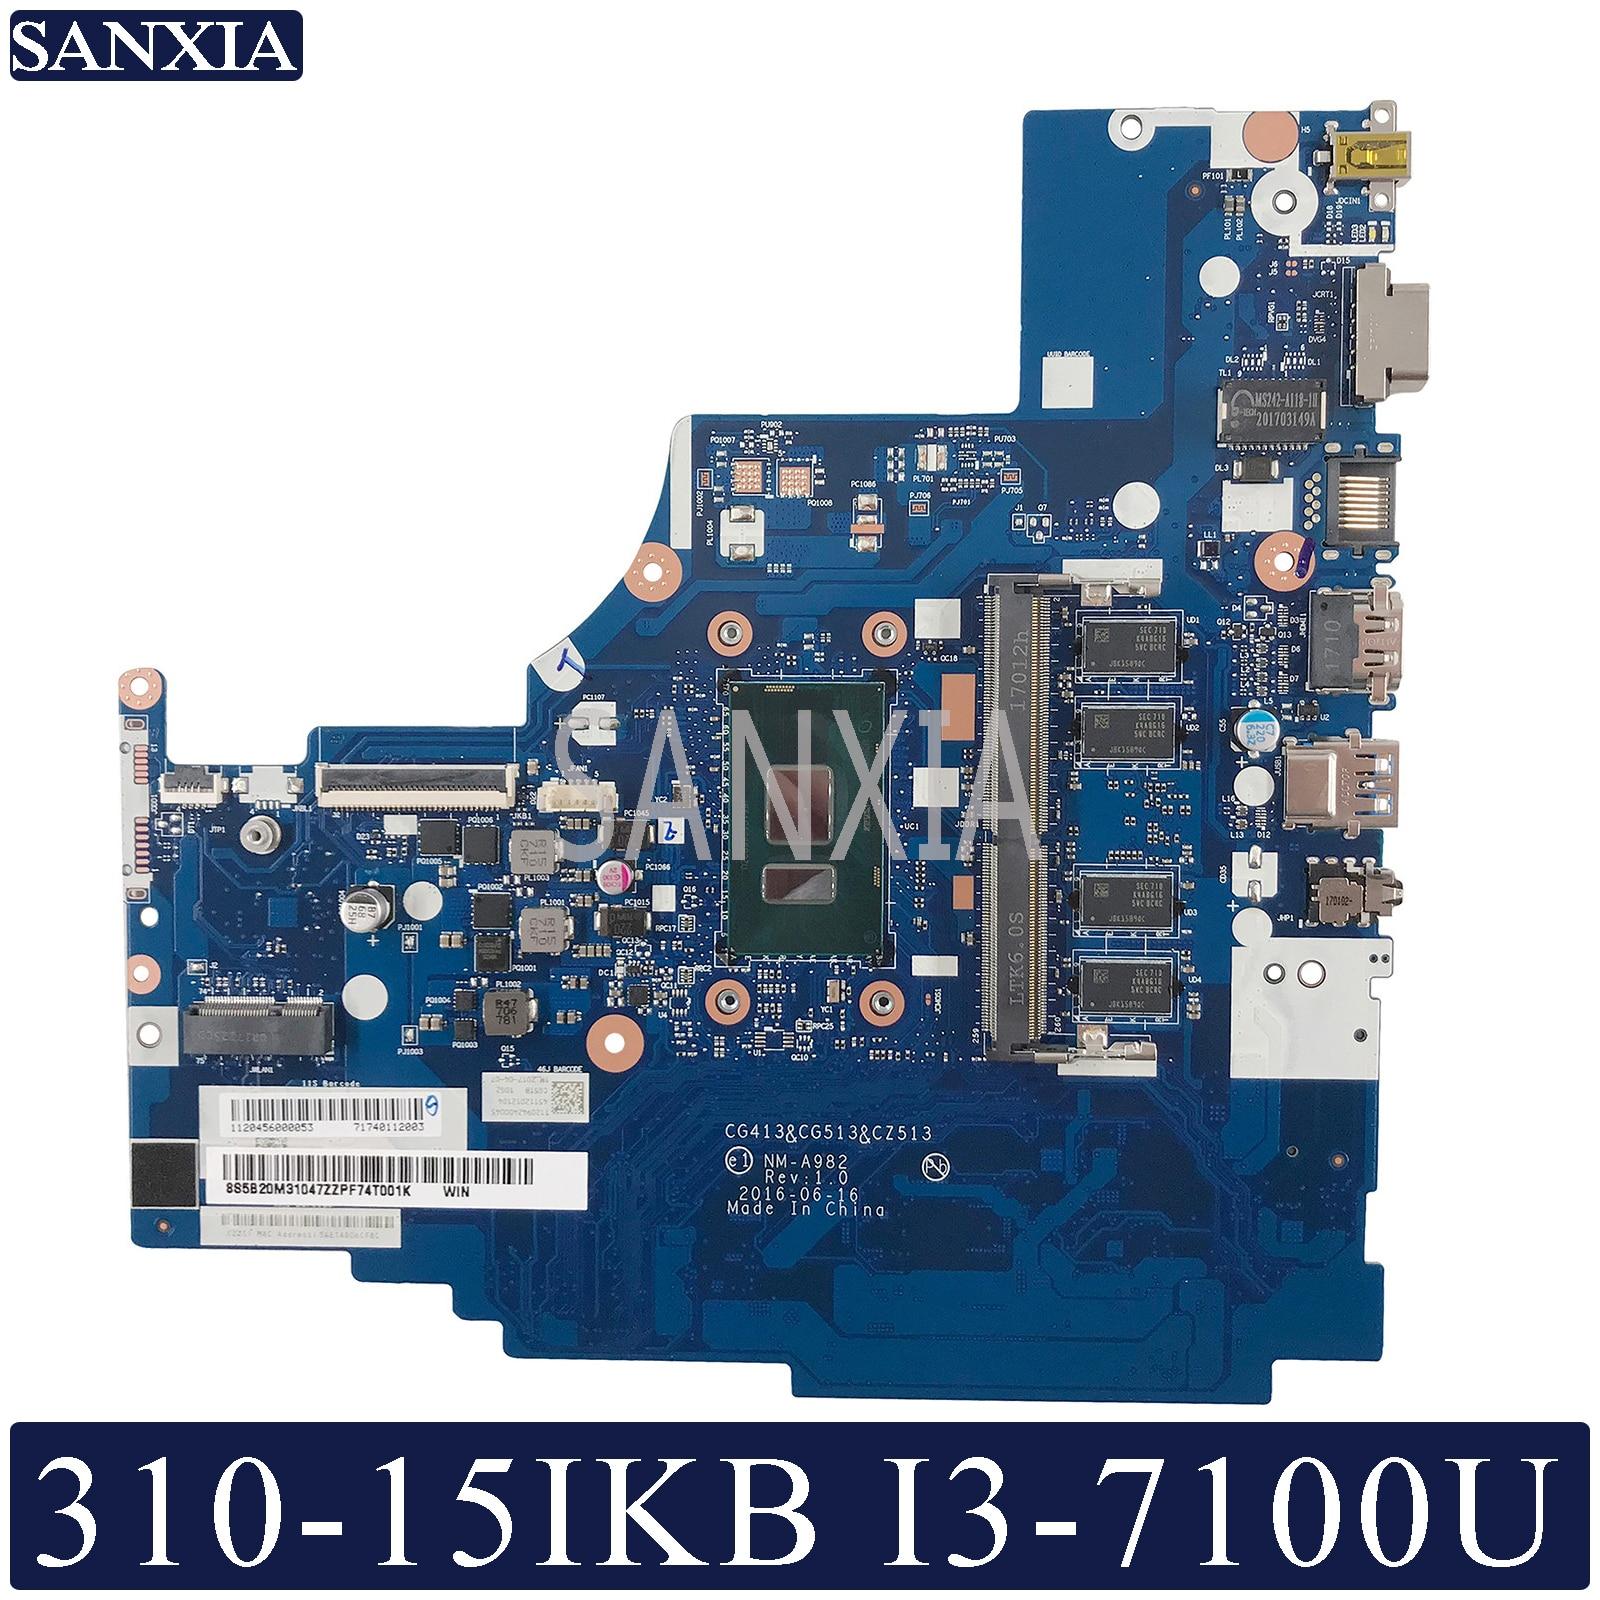 KEFU NM-A982 Laptop Motherboard For Lenovo 310-15IKB Original Mainboard 4G-RAM I3-7100U